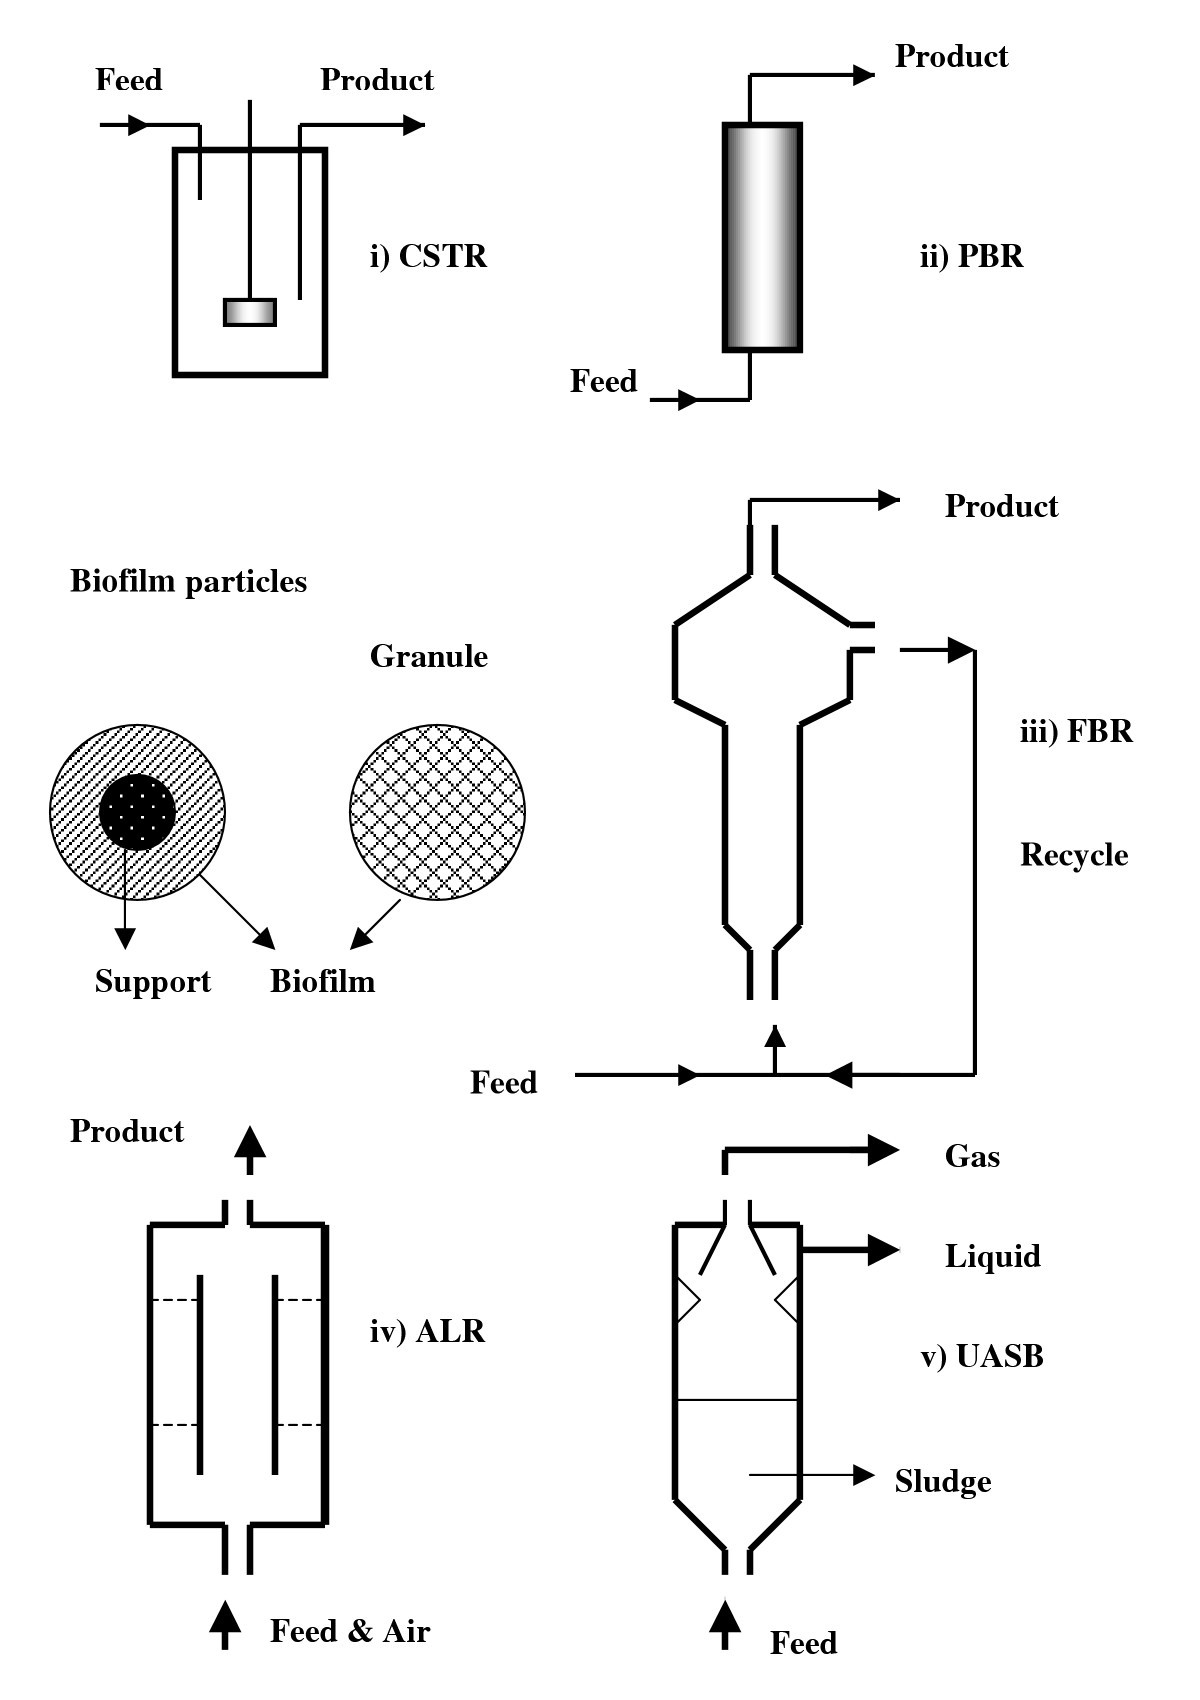 Biofilm Reactors For Industrial Bioconversion Processes Employing Process Flow Diagram Reactor Figure 1